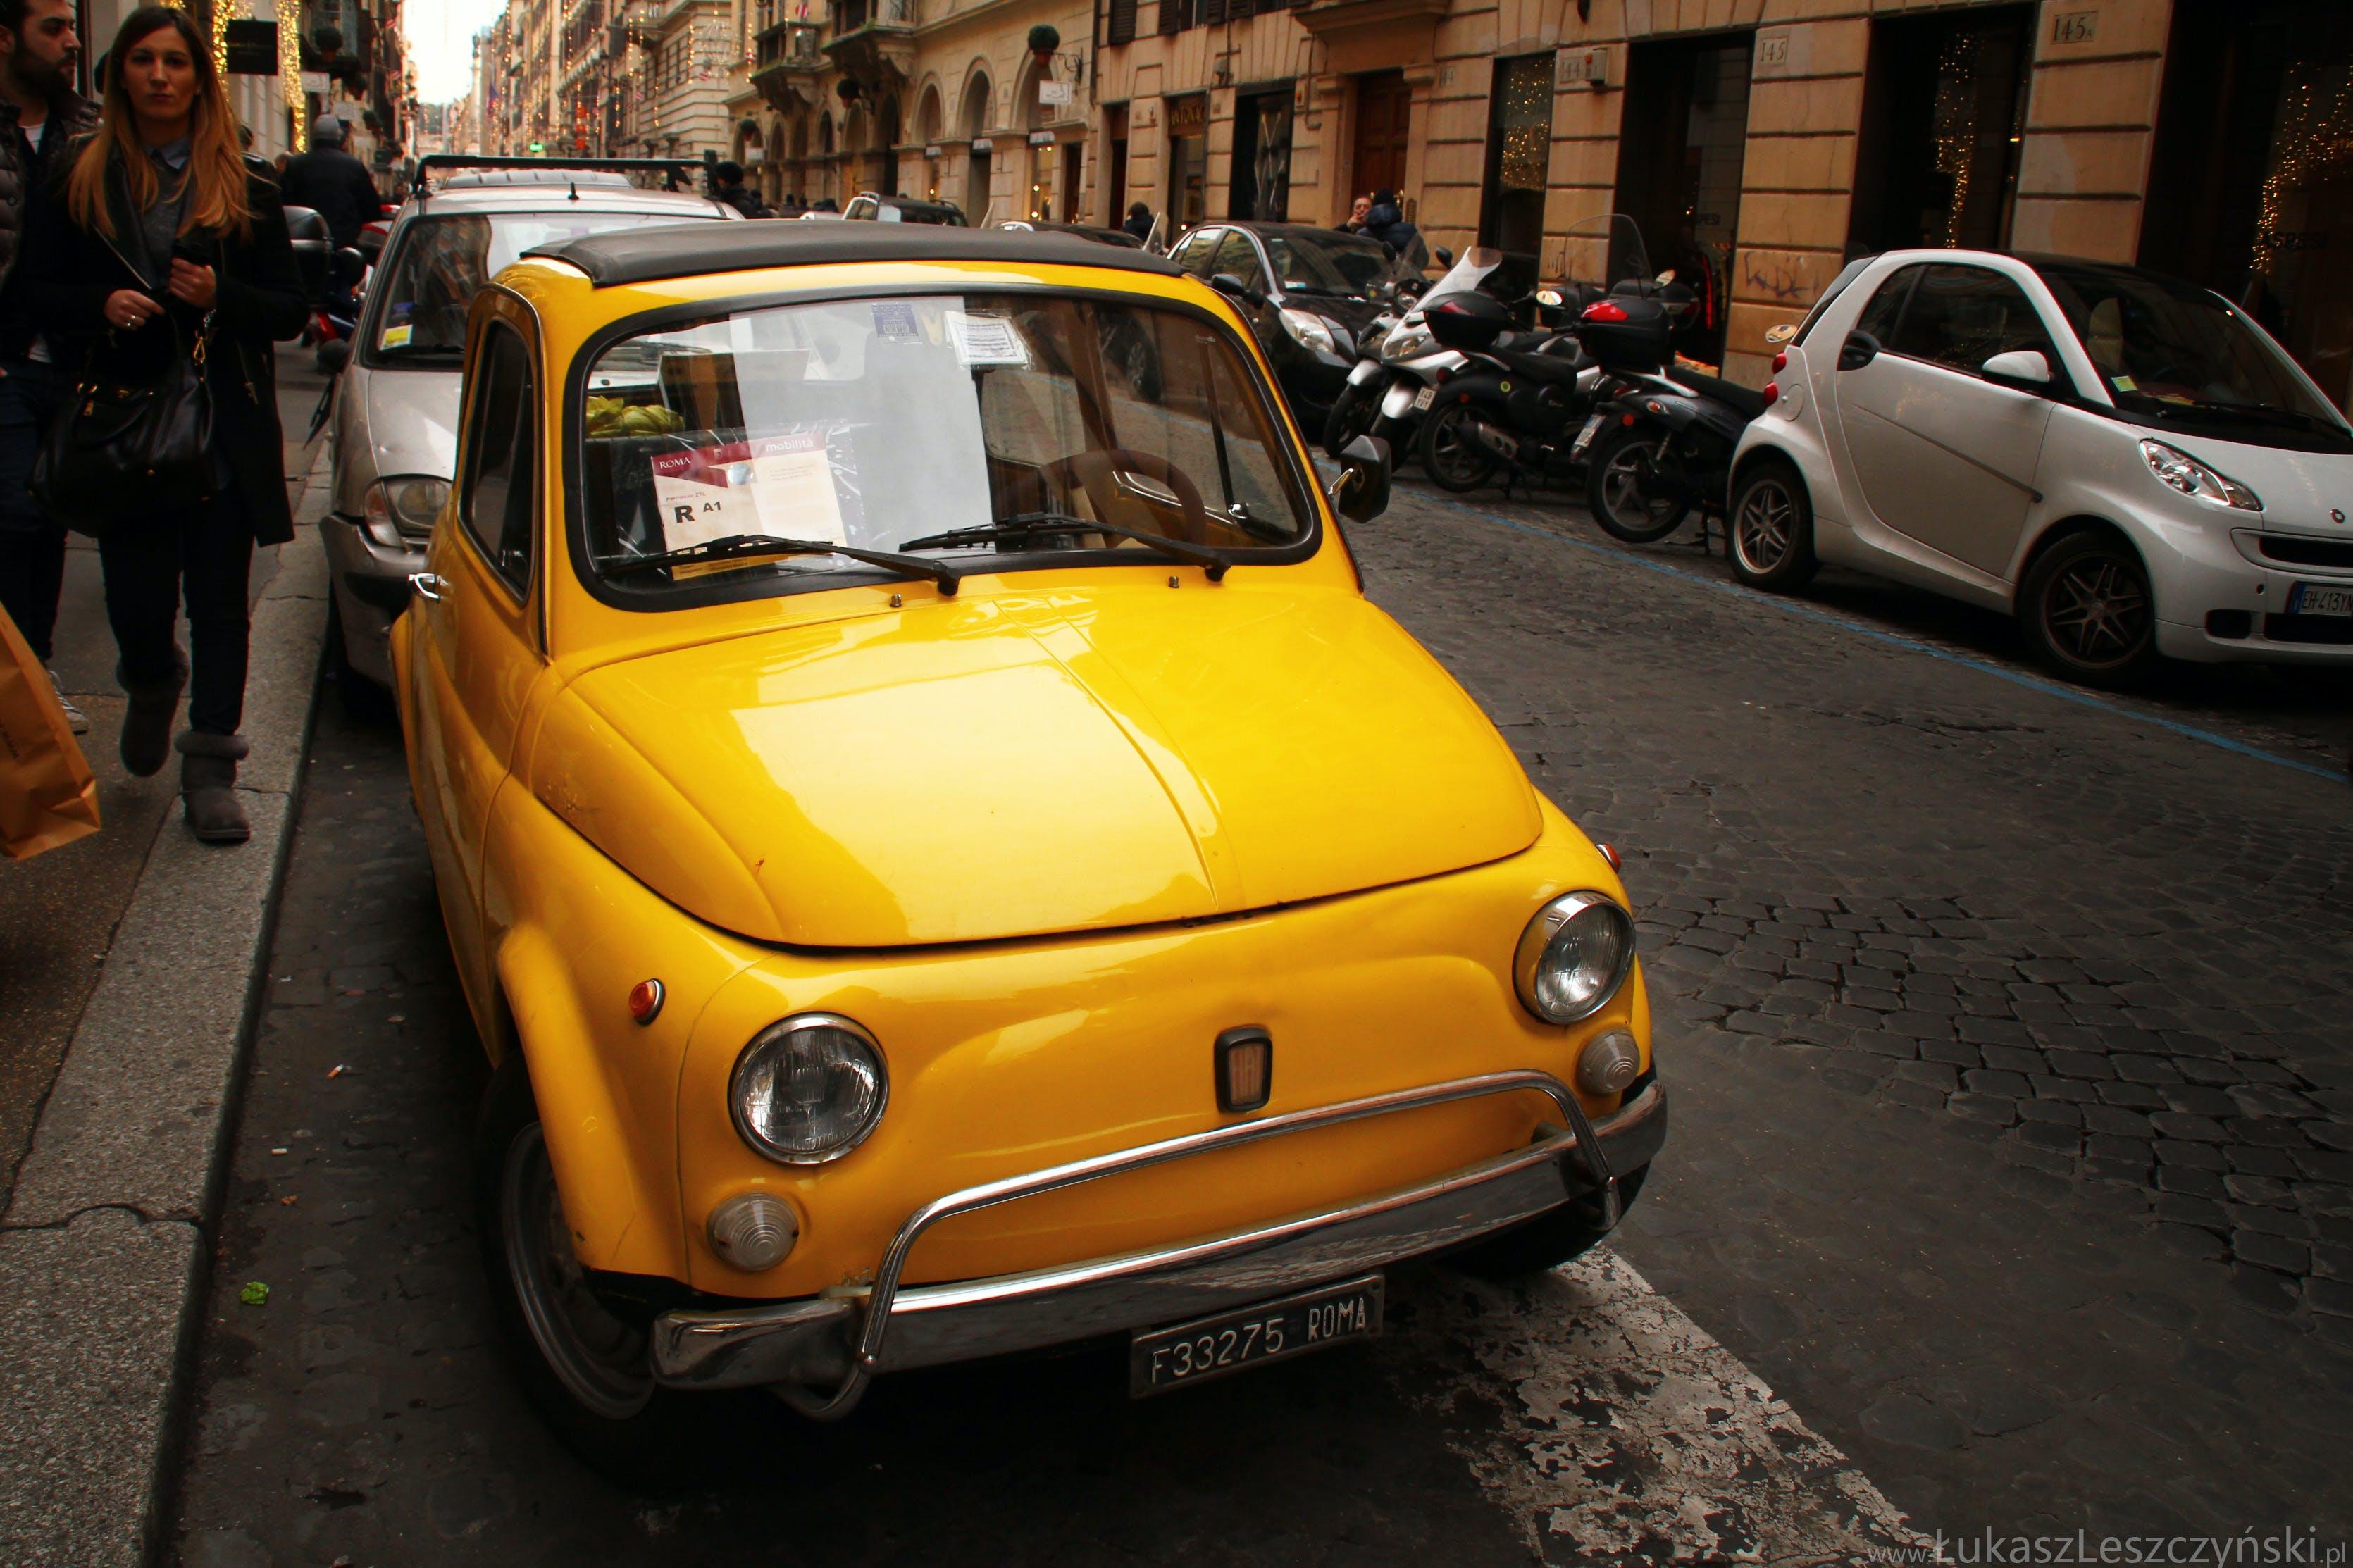 Free stock photo of Yellow Fiat